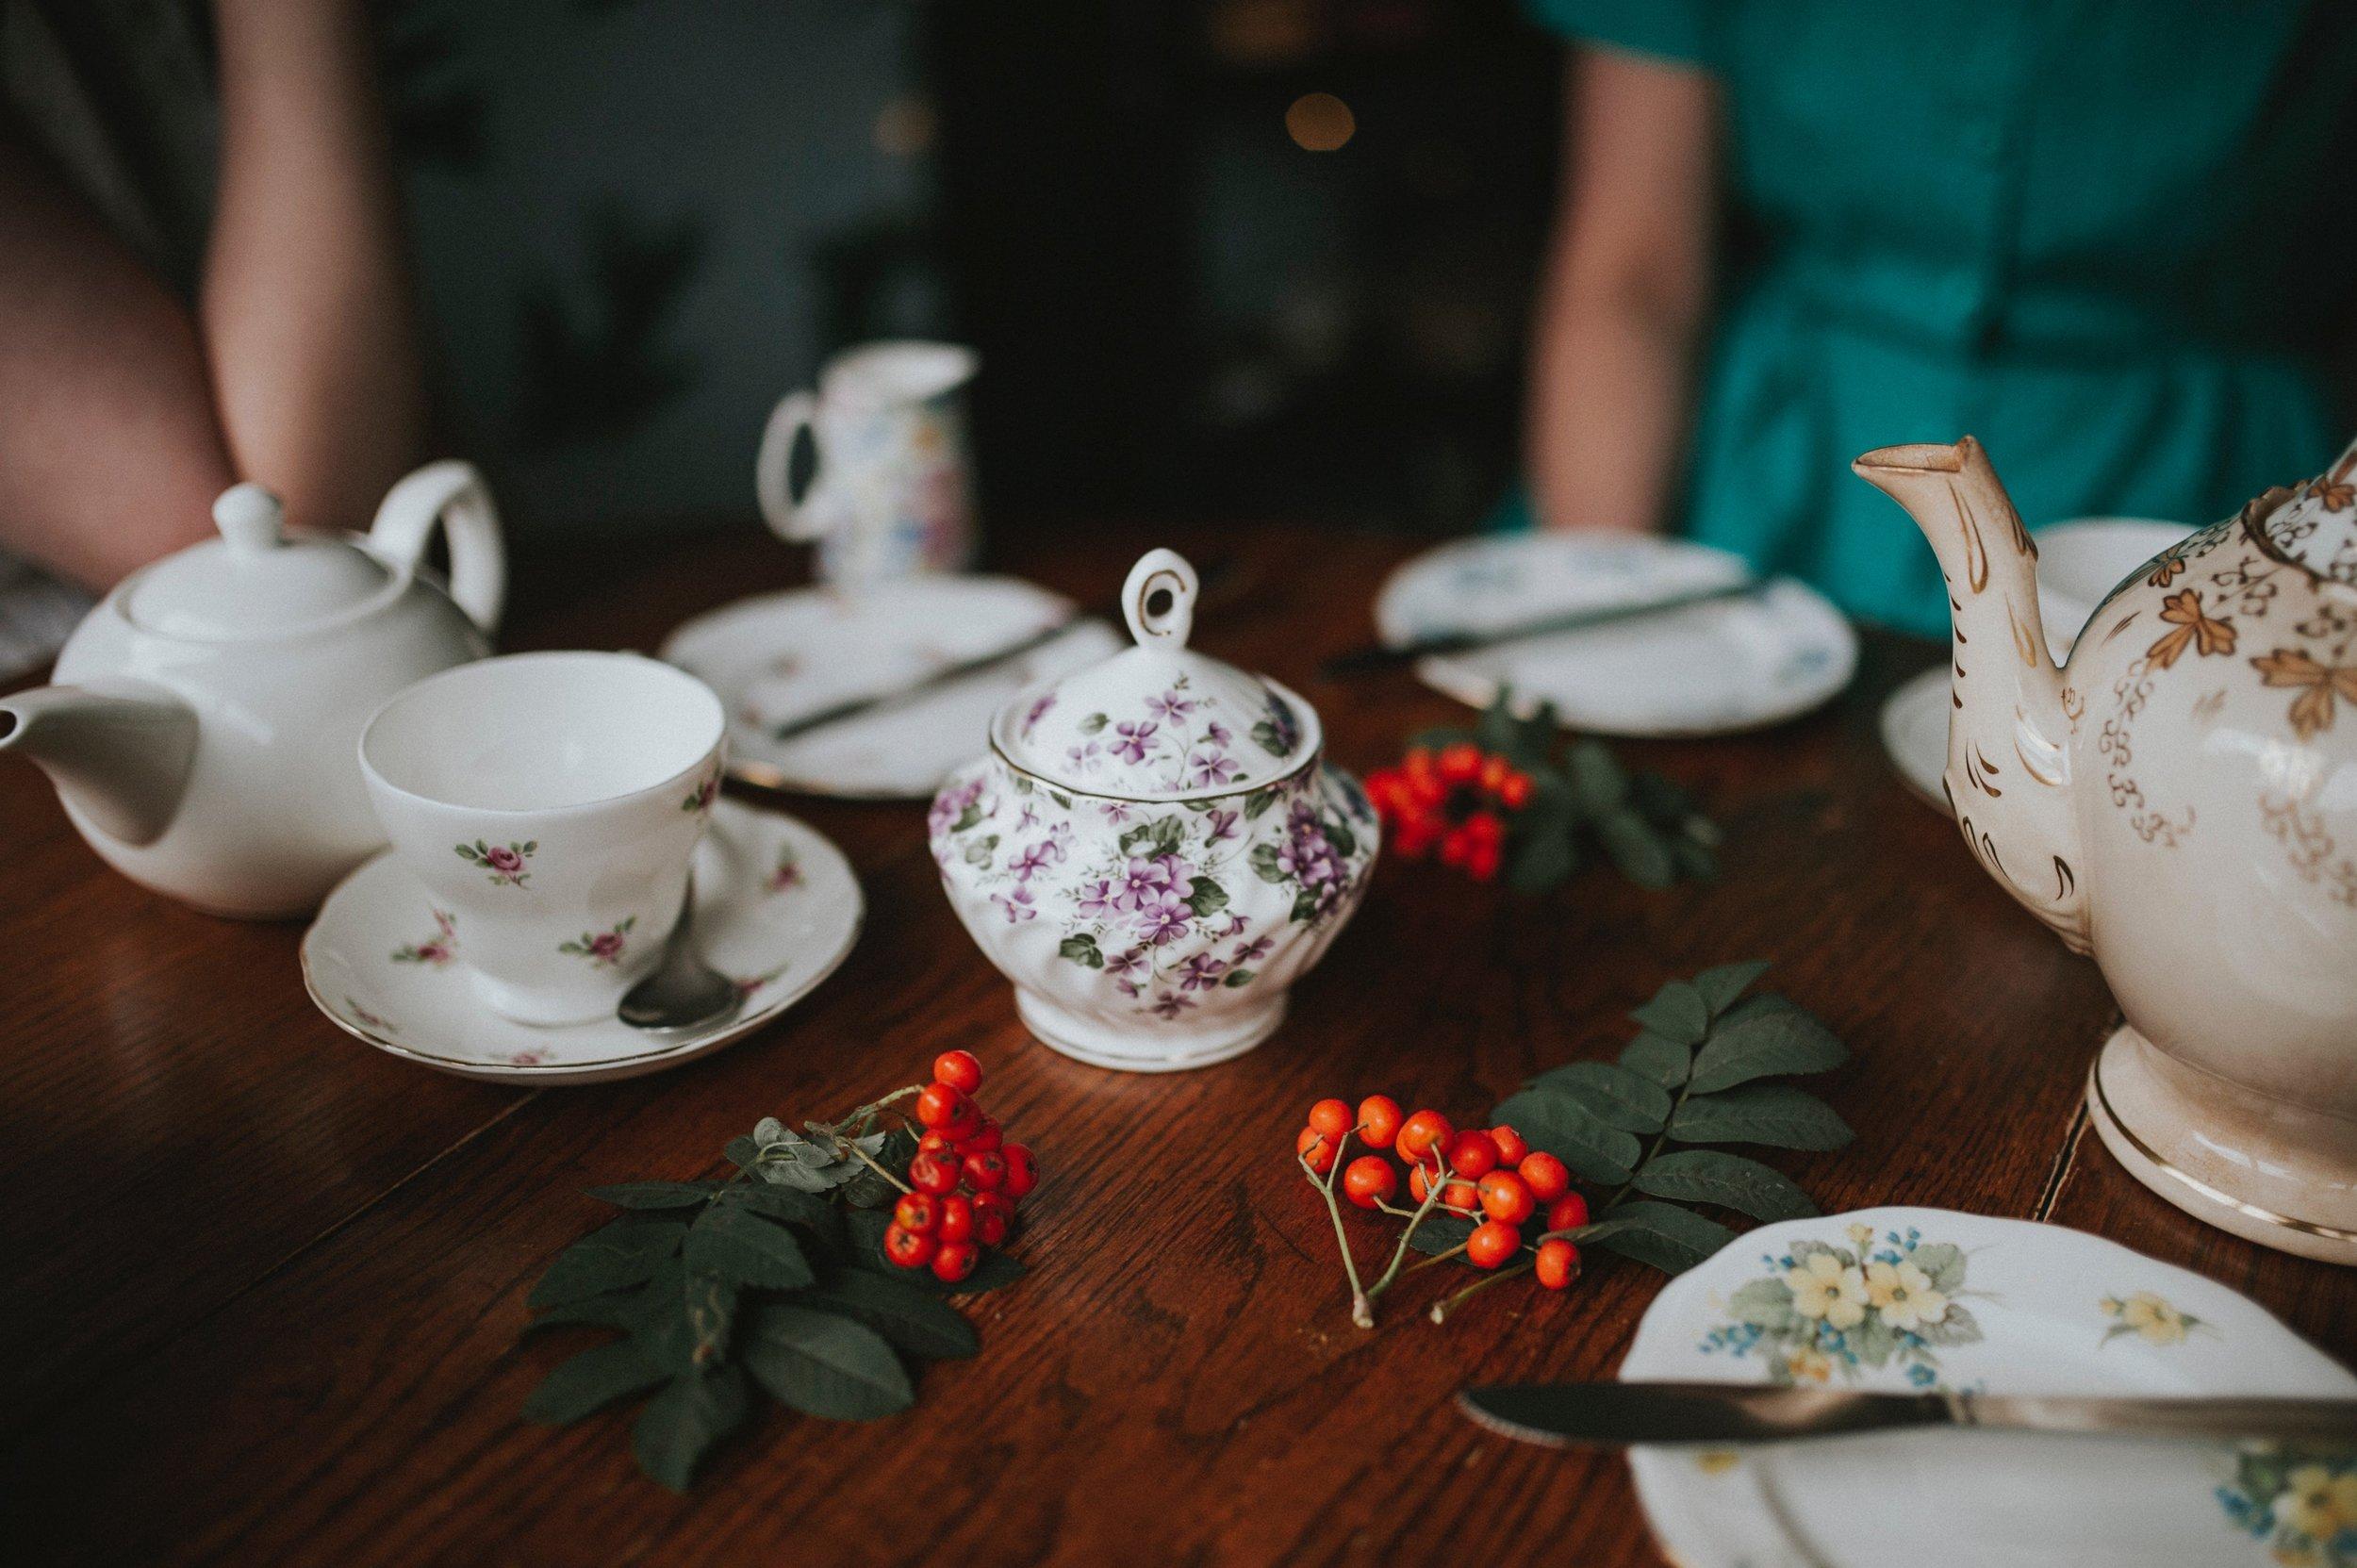 tea party l'angolo del focolare.jpg